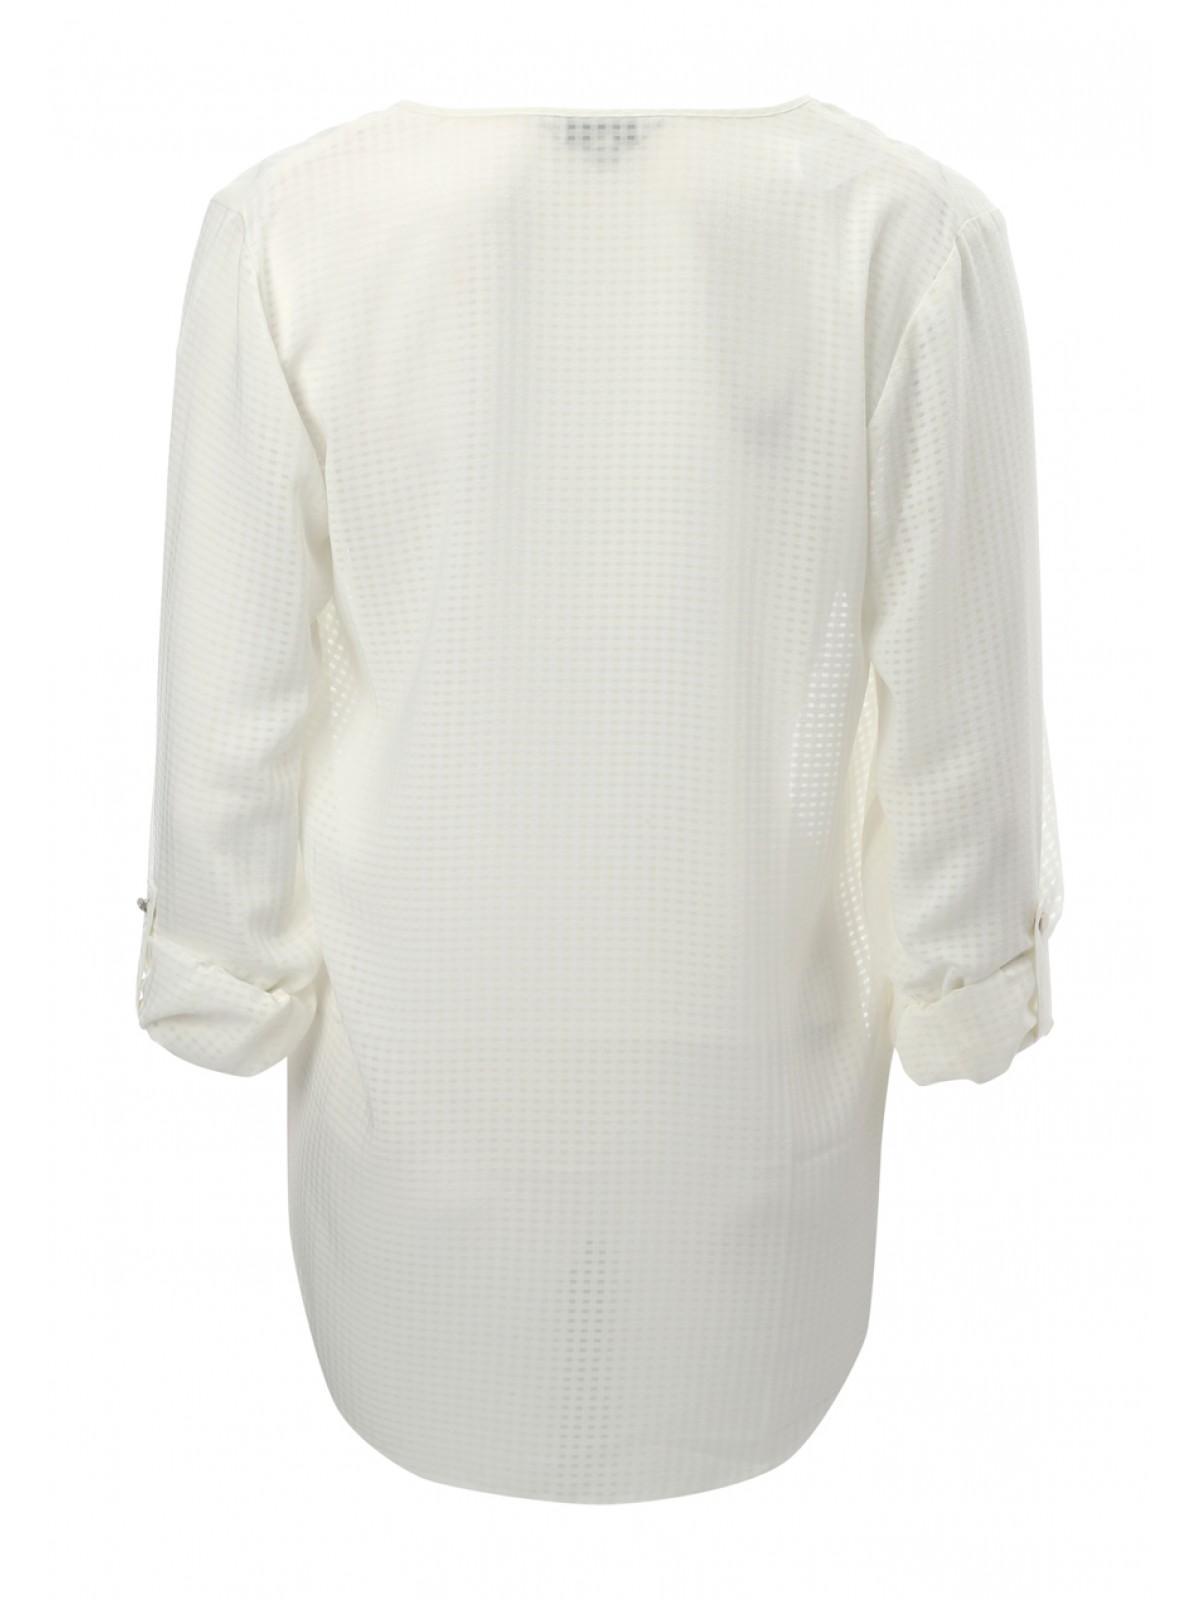 Womens White Blouses Long Sleeve